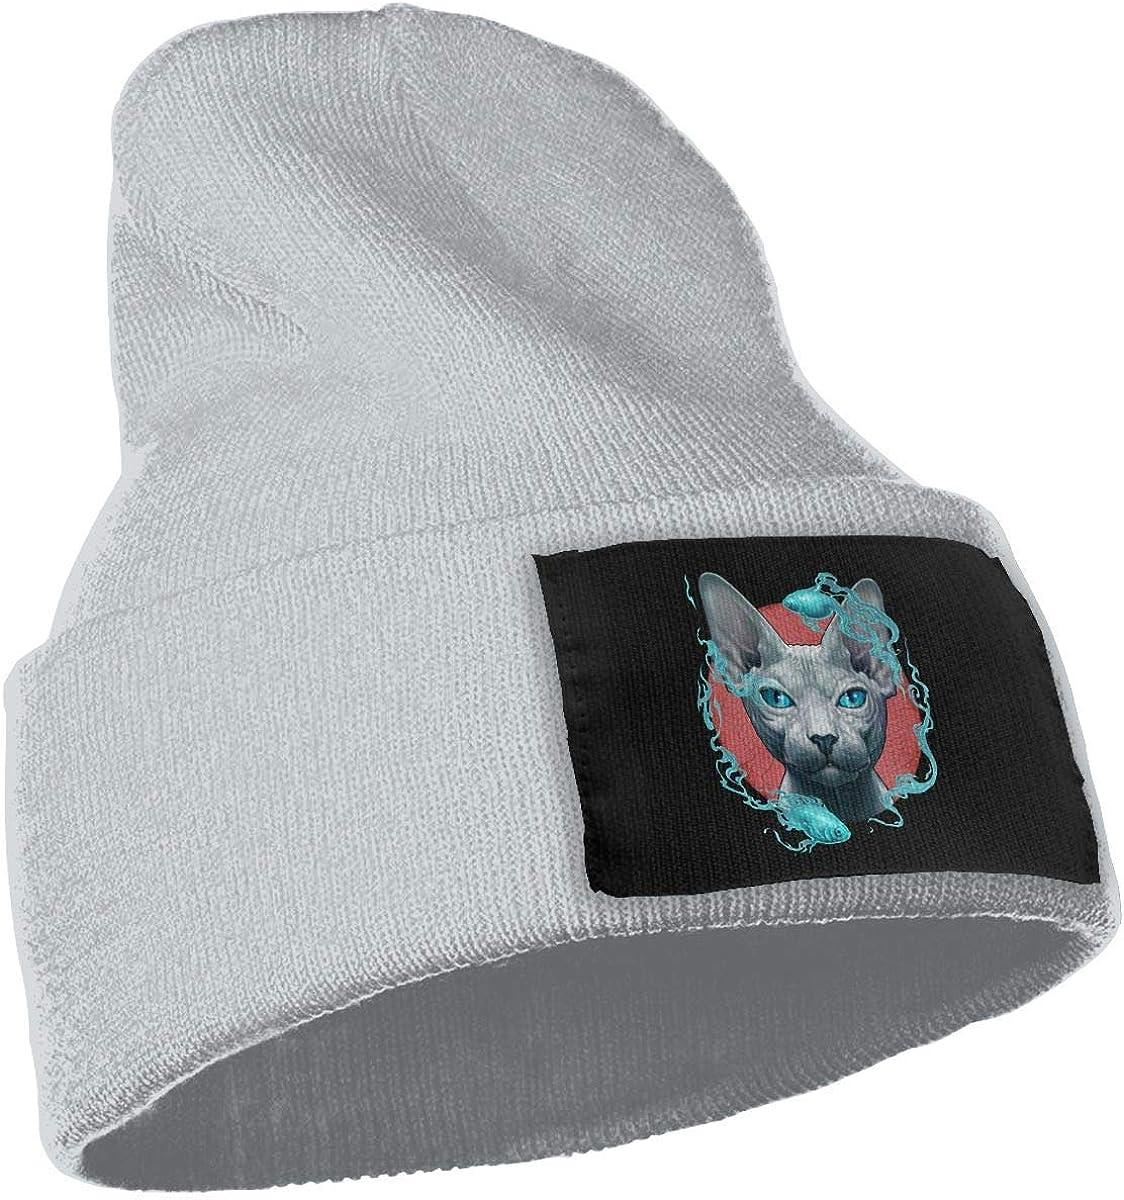 Now Go Away Warm Winter Hat Knit Beanie Skull Cap Cuff Beanie Hat Winter Hats for Men /& Women Newtons 1st Law